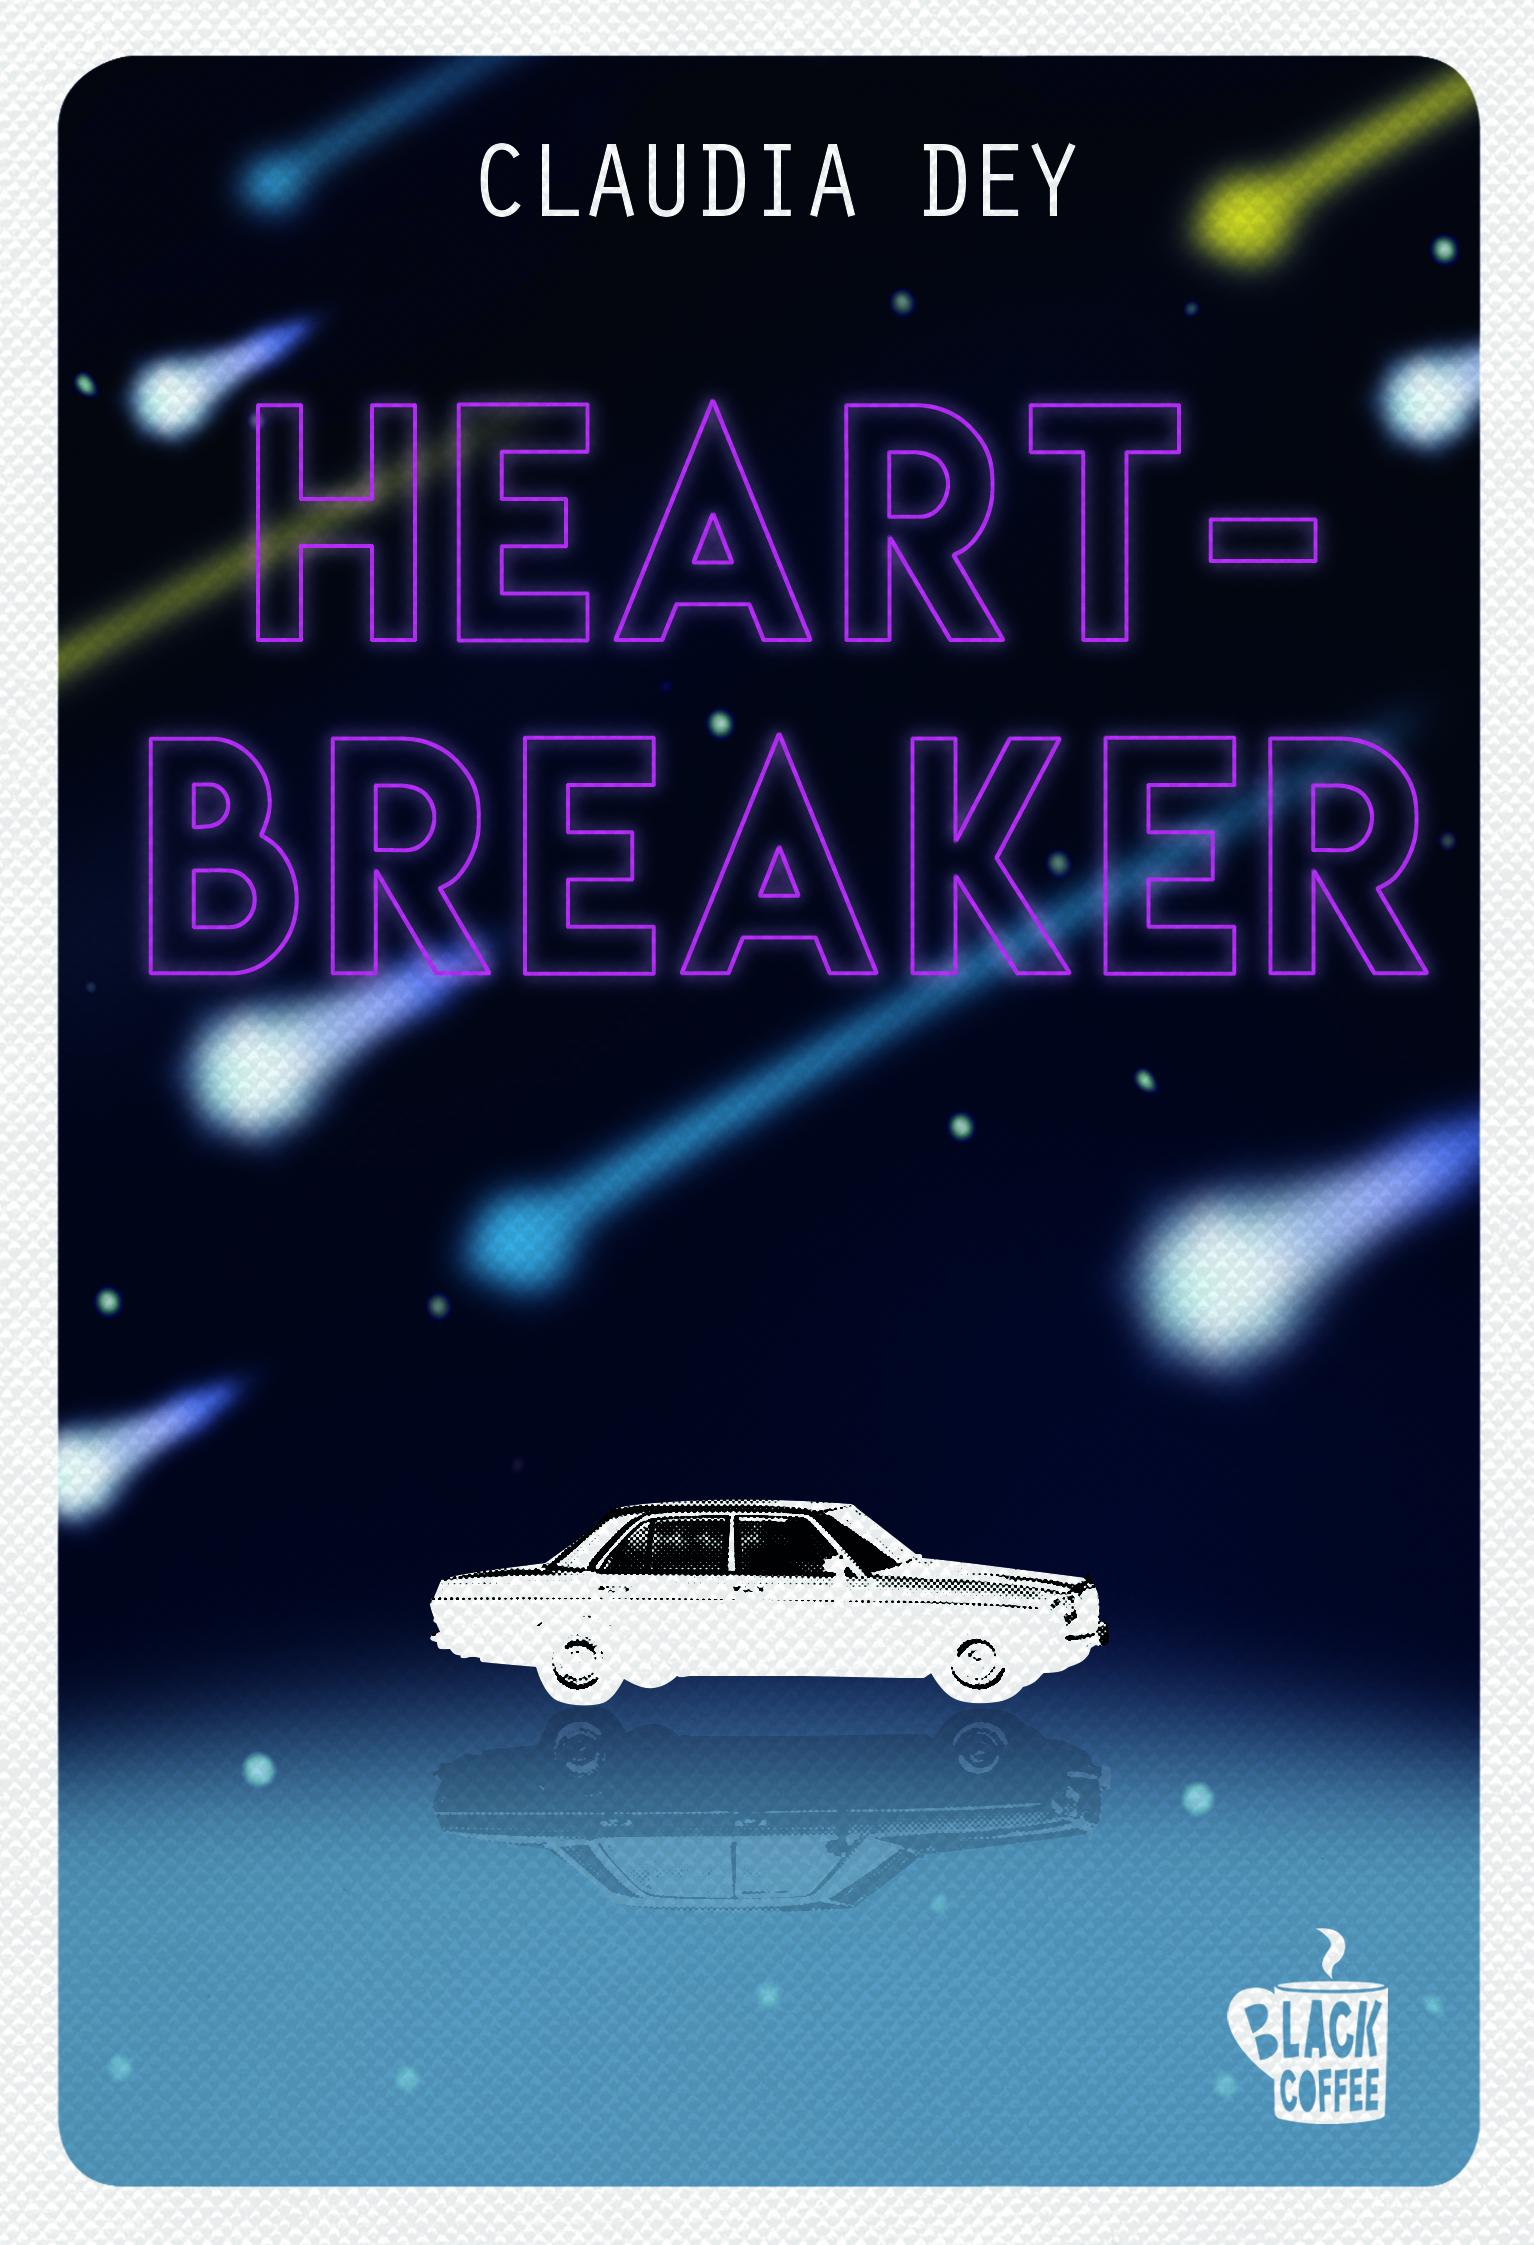 Claudia Dey autrice Heartbreaker